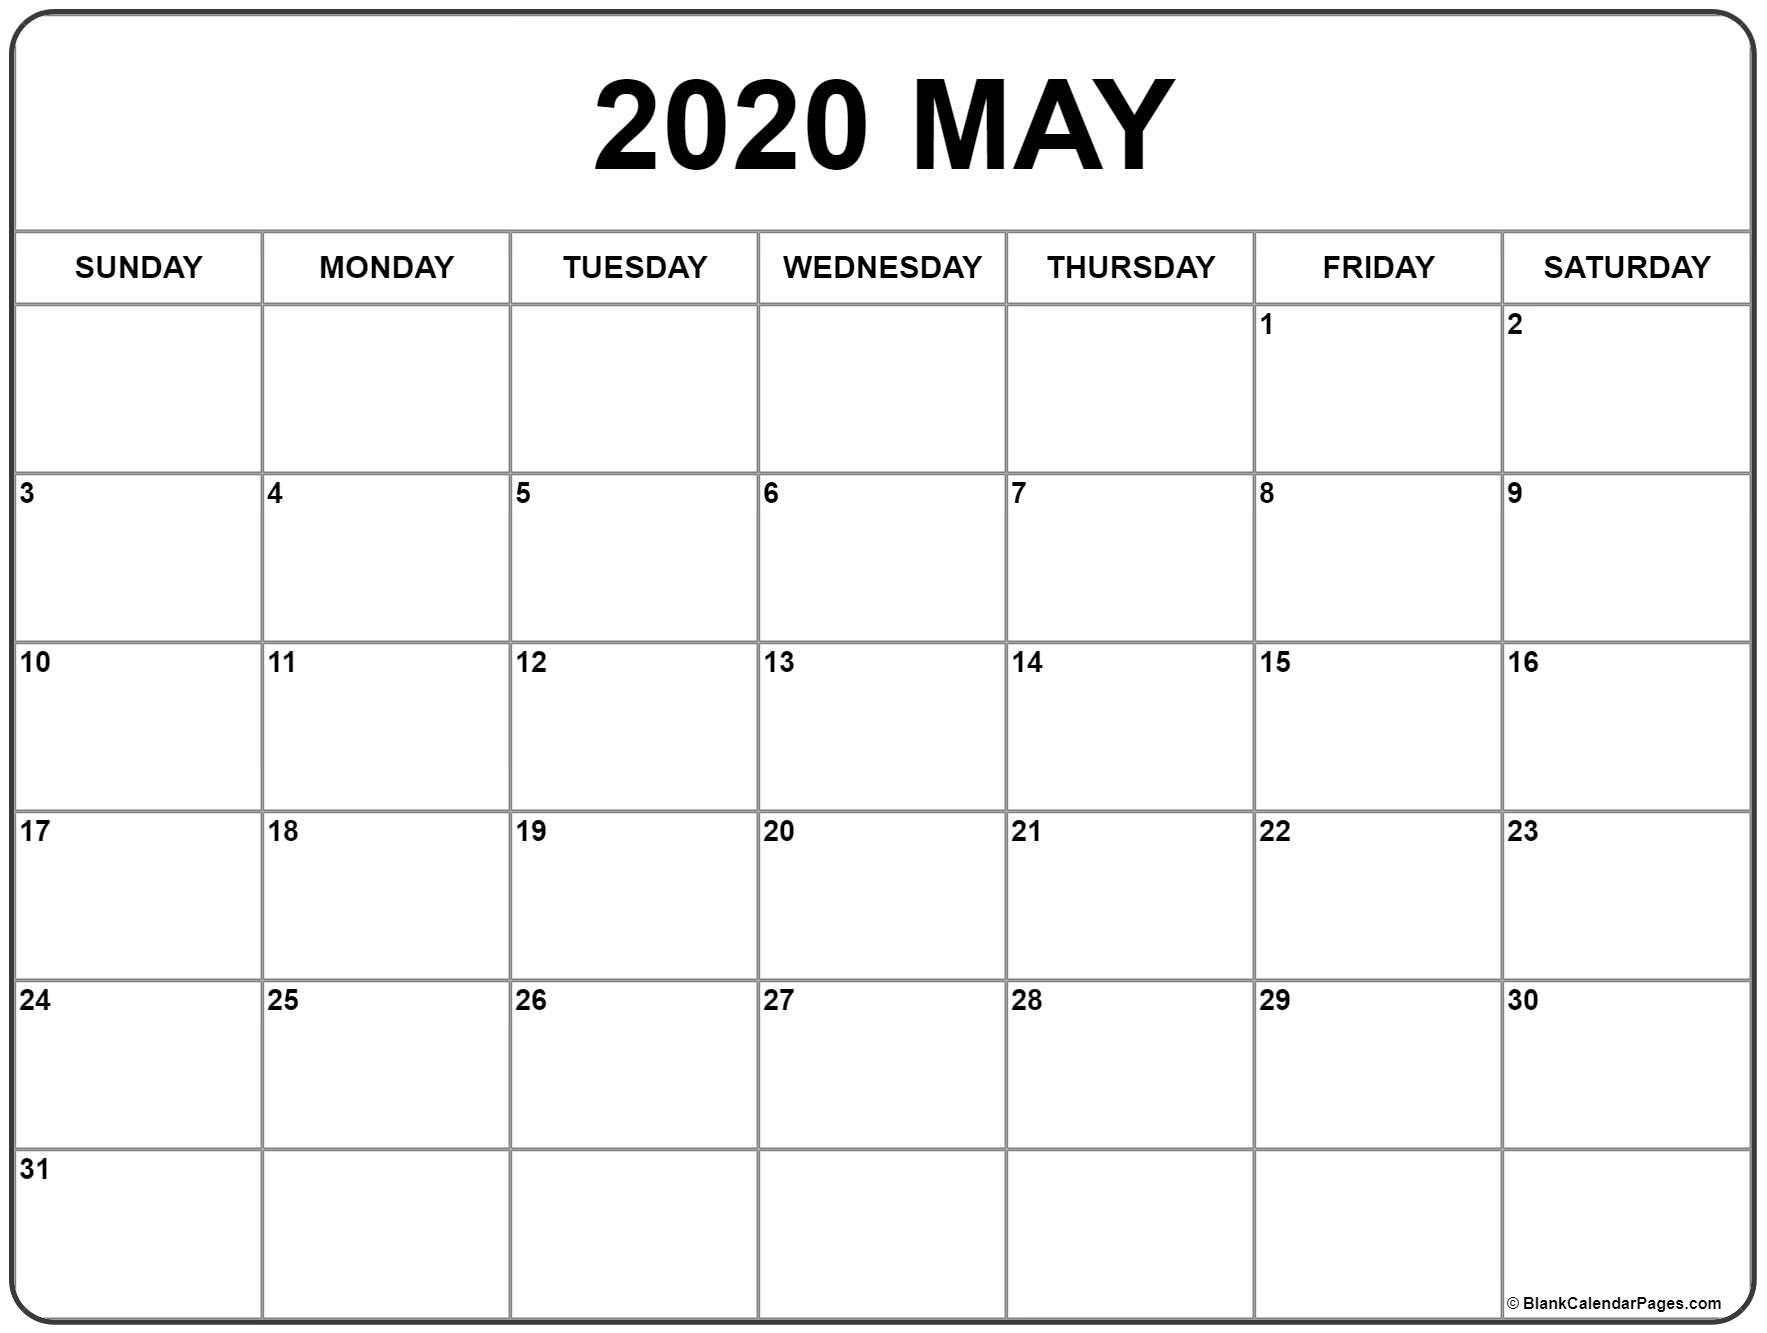 May 2020 Calendar | Free Printable Monthly Calendars  2020 Calendar Printable Free